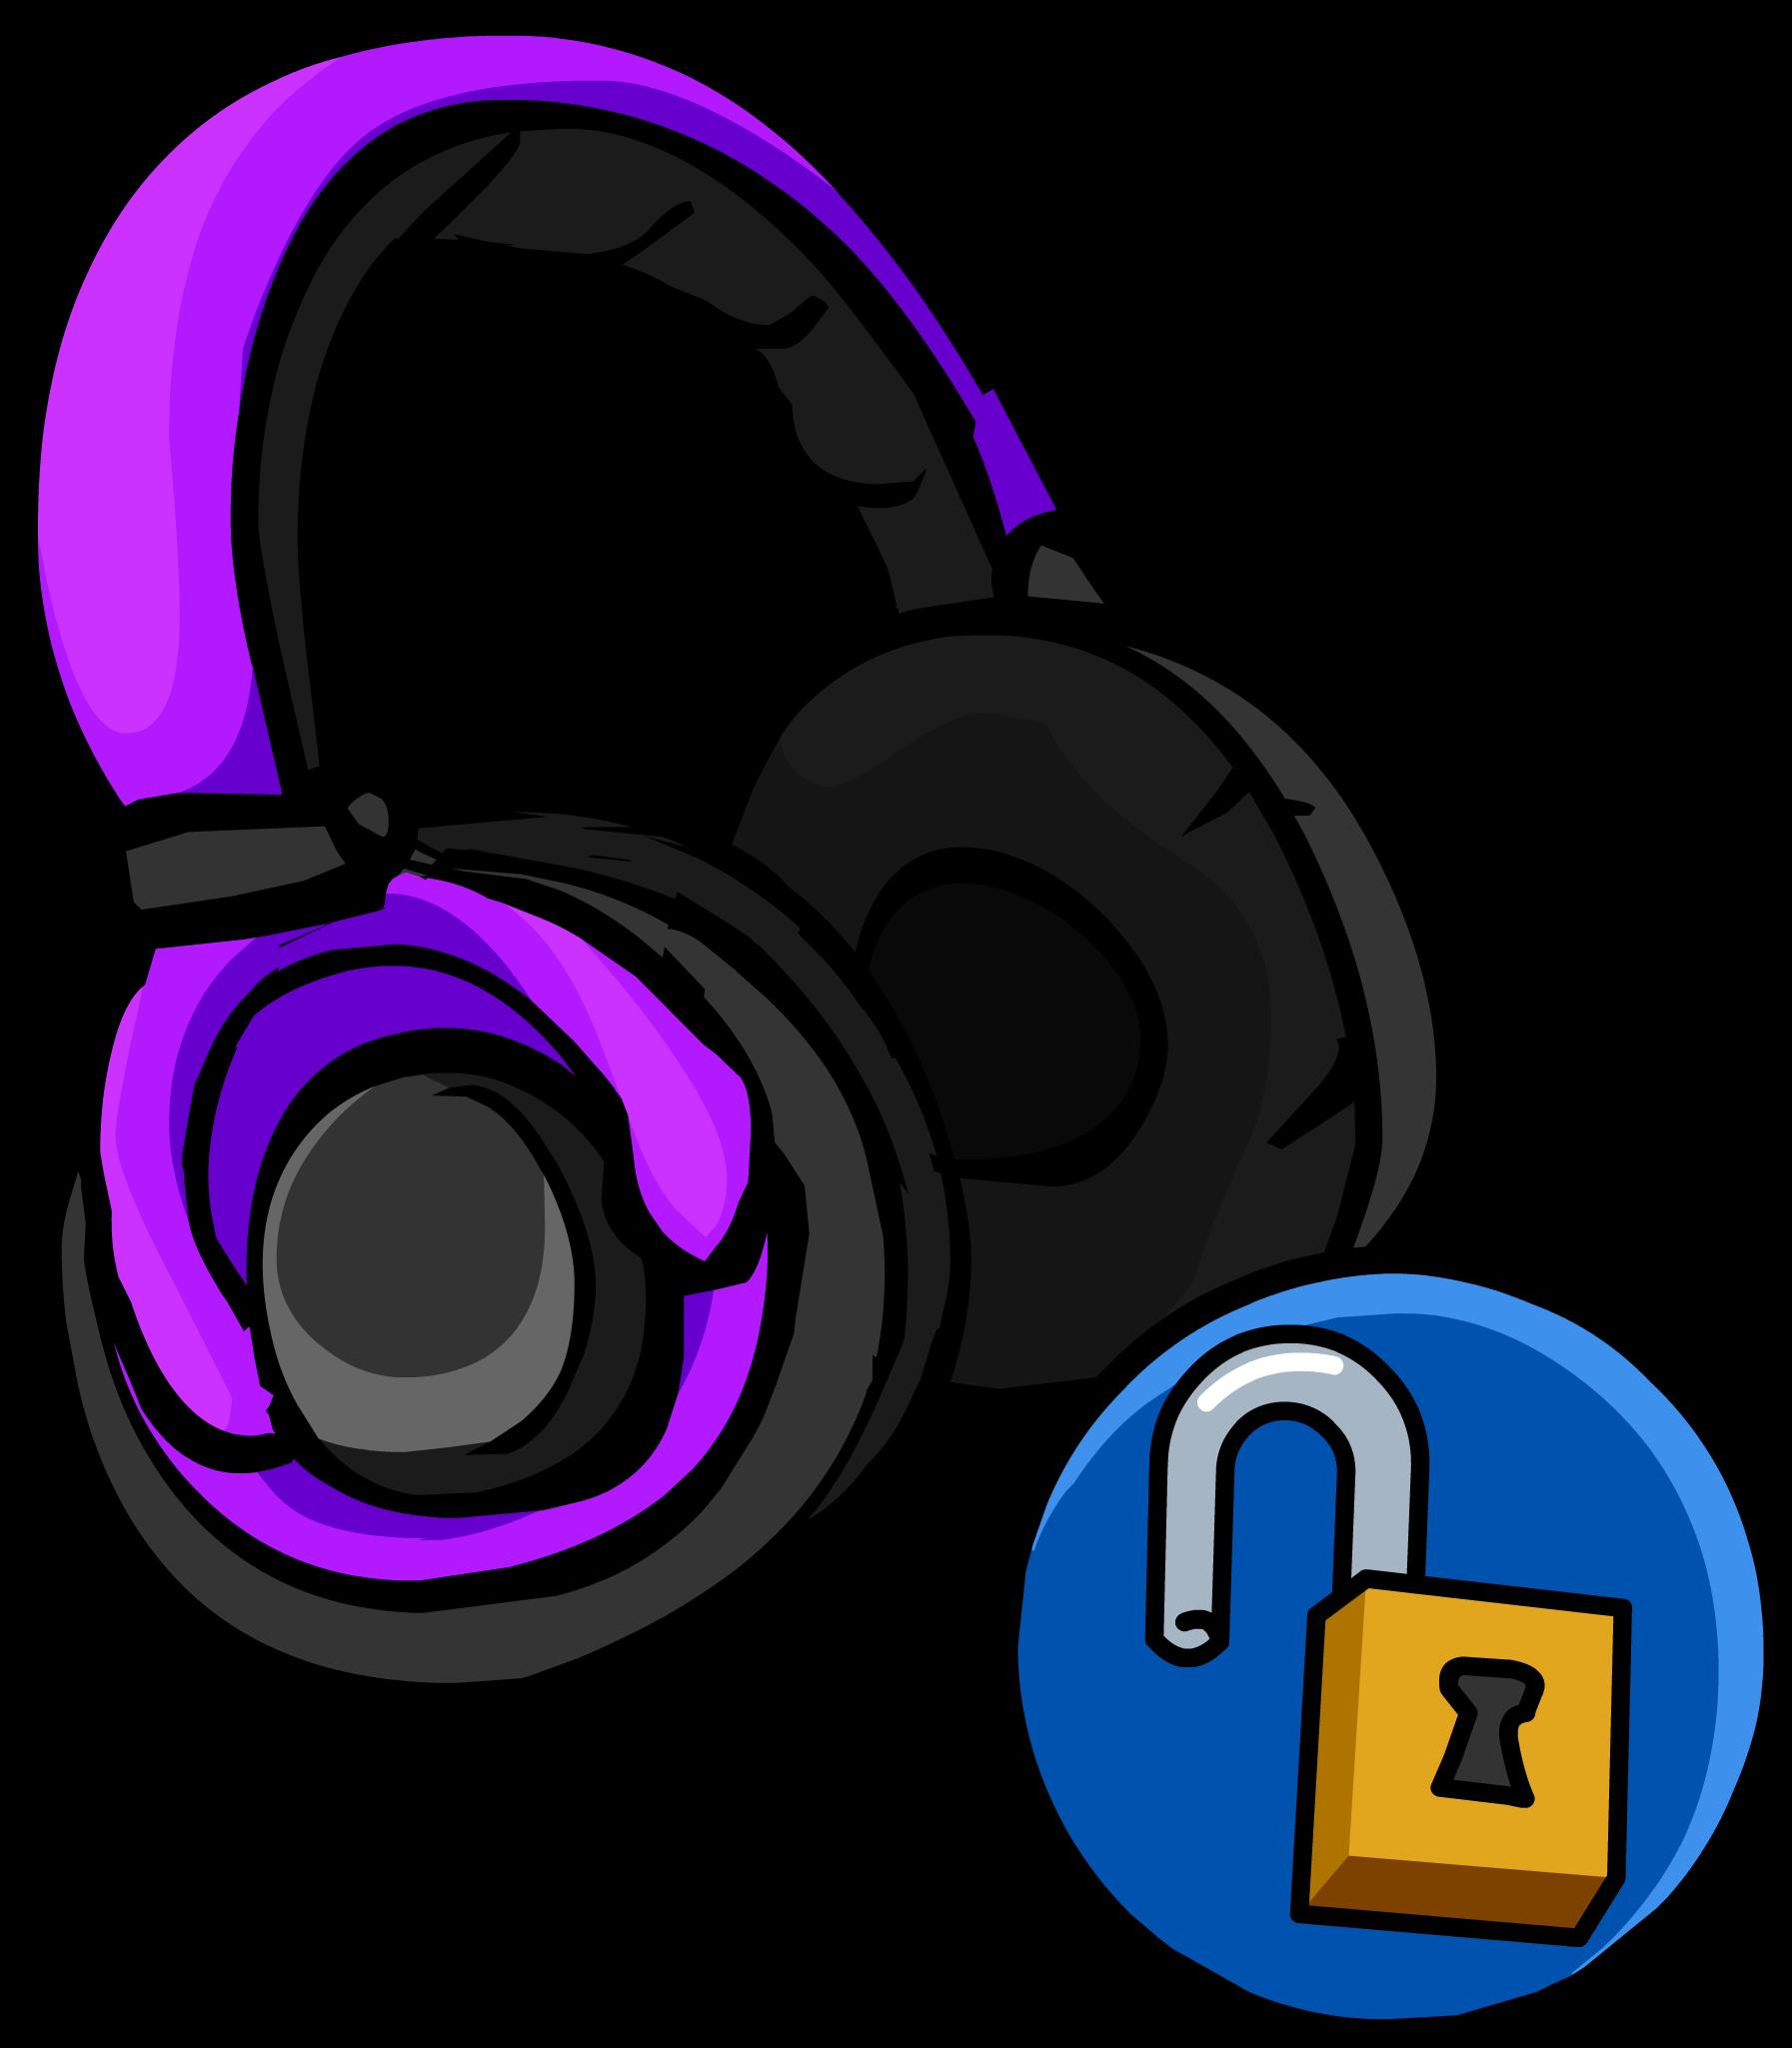 Purple Headphones Club Penguin Wiki Fandom Powered By